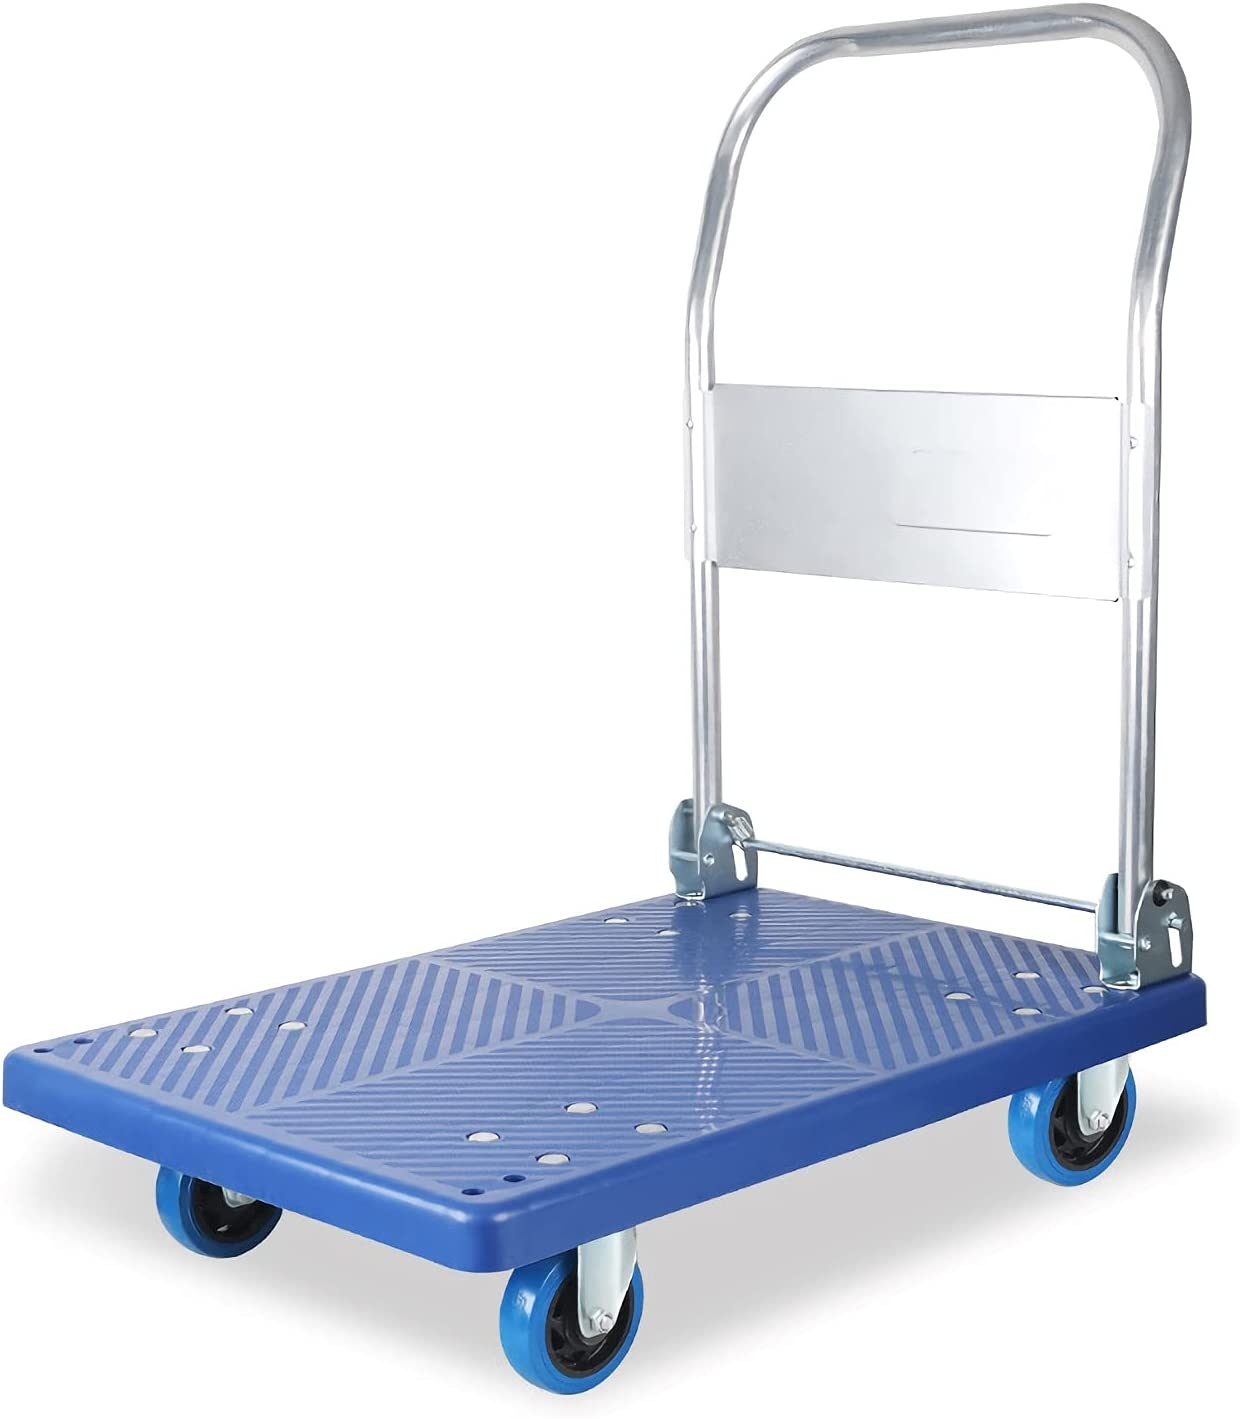 DALIZHAI777 Very popular Platform Cart Push Over item handling Trolley Pane Plastic Durable